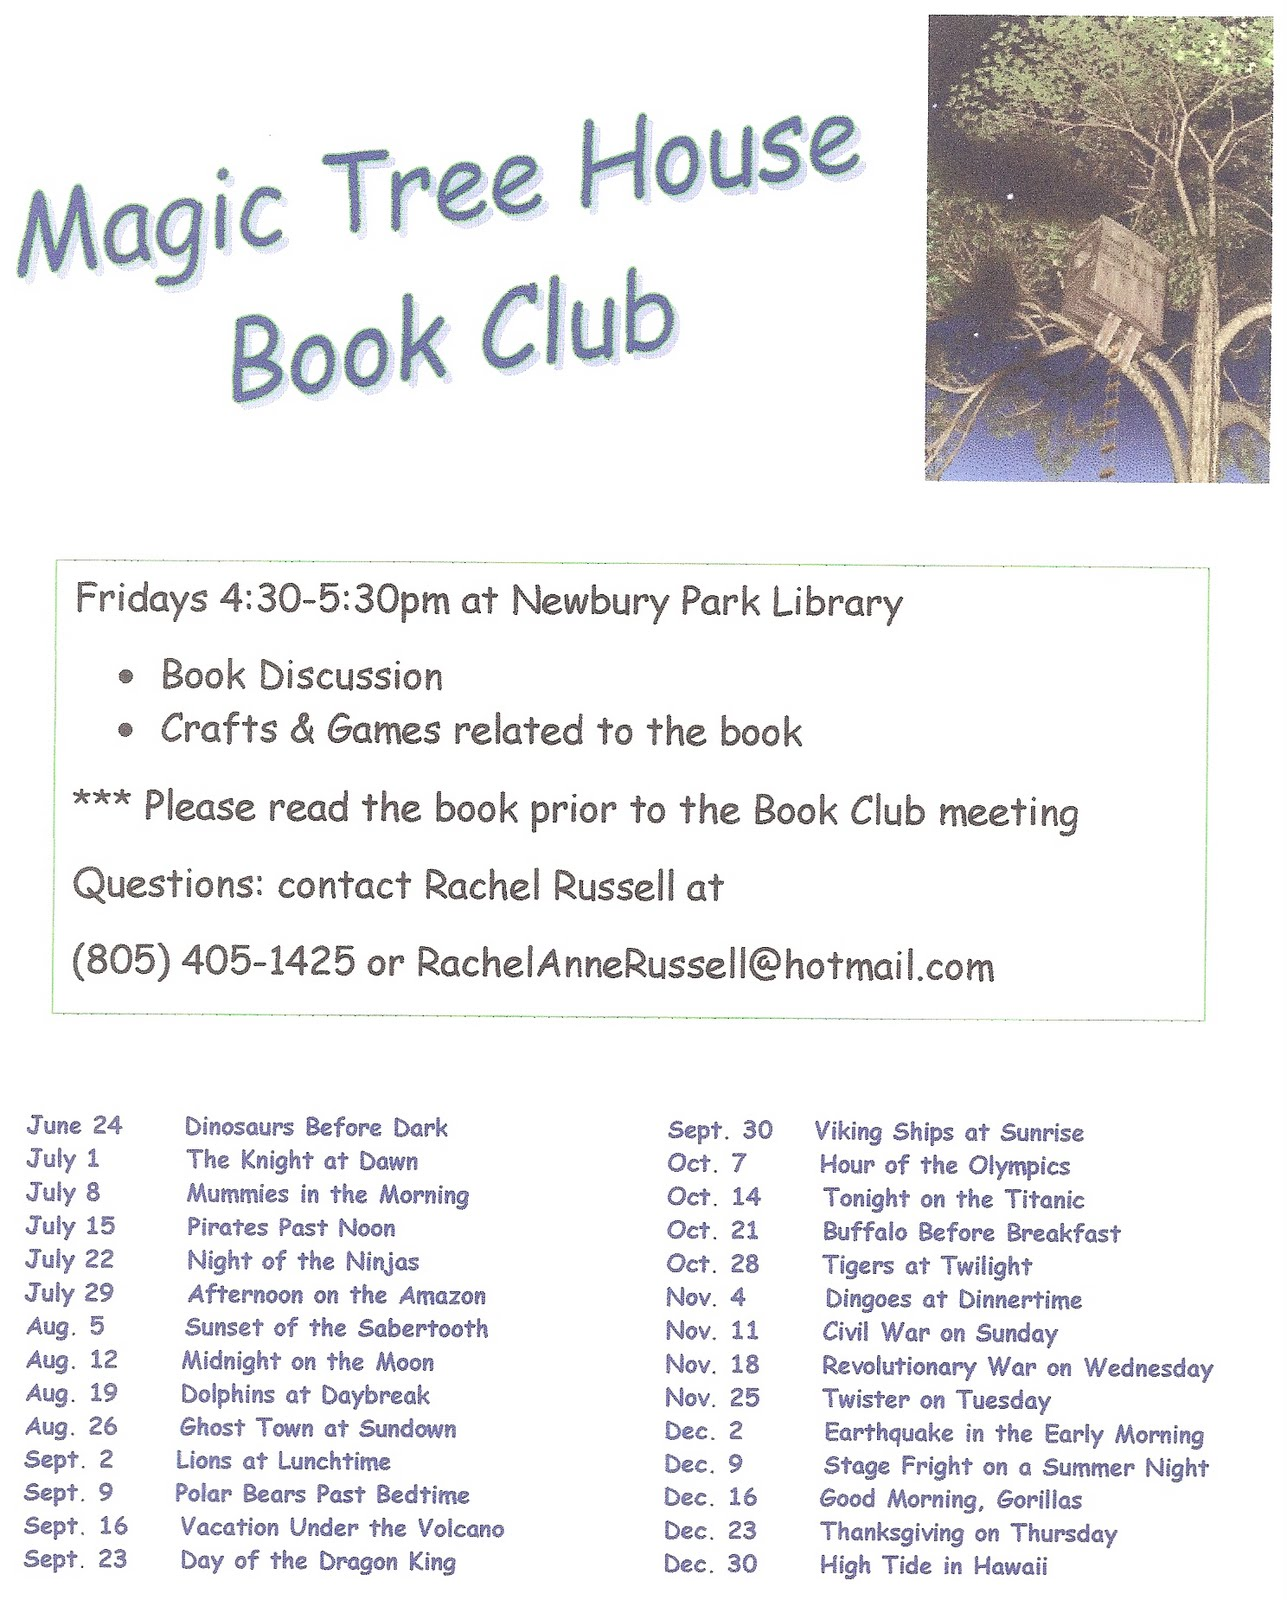 Magic Tree House Book Club July